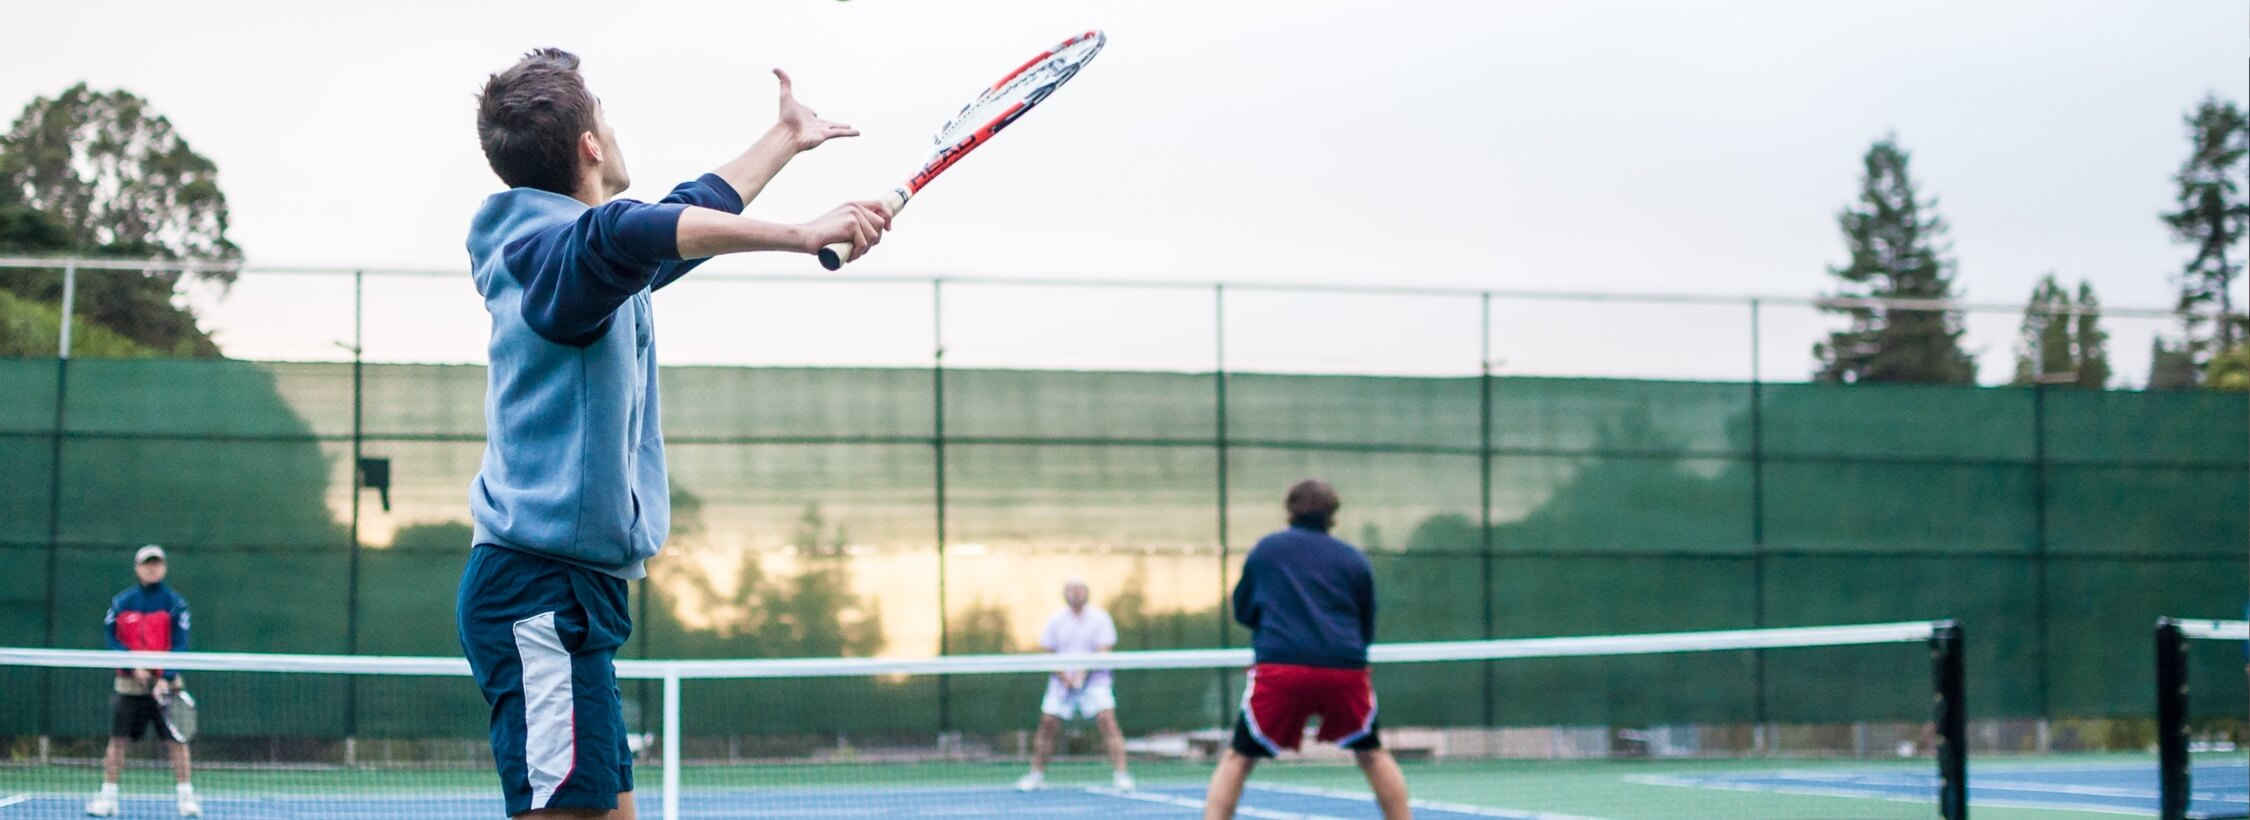 Tennisspieler bei Abschlag.